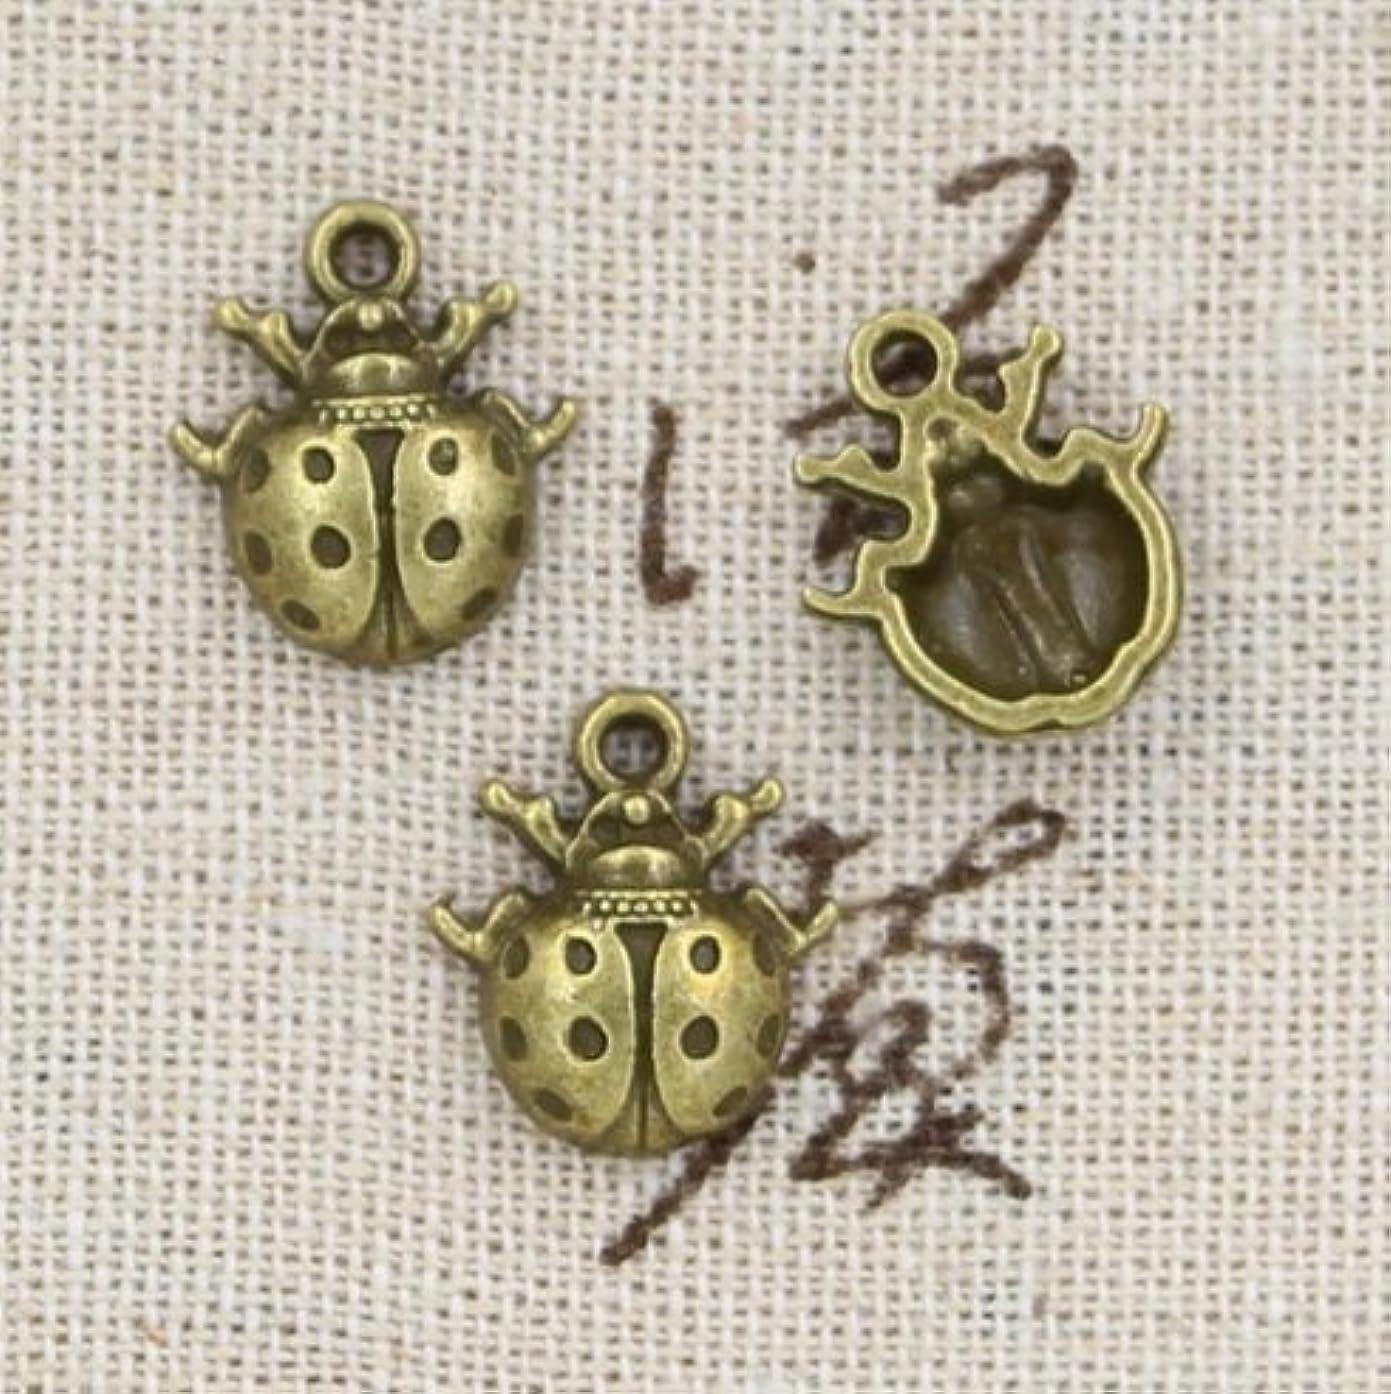 12 Ladybug Charm Antique Bronze Charm Antique Bronze Plated Metal (16x14mm) (CB189)